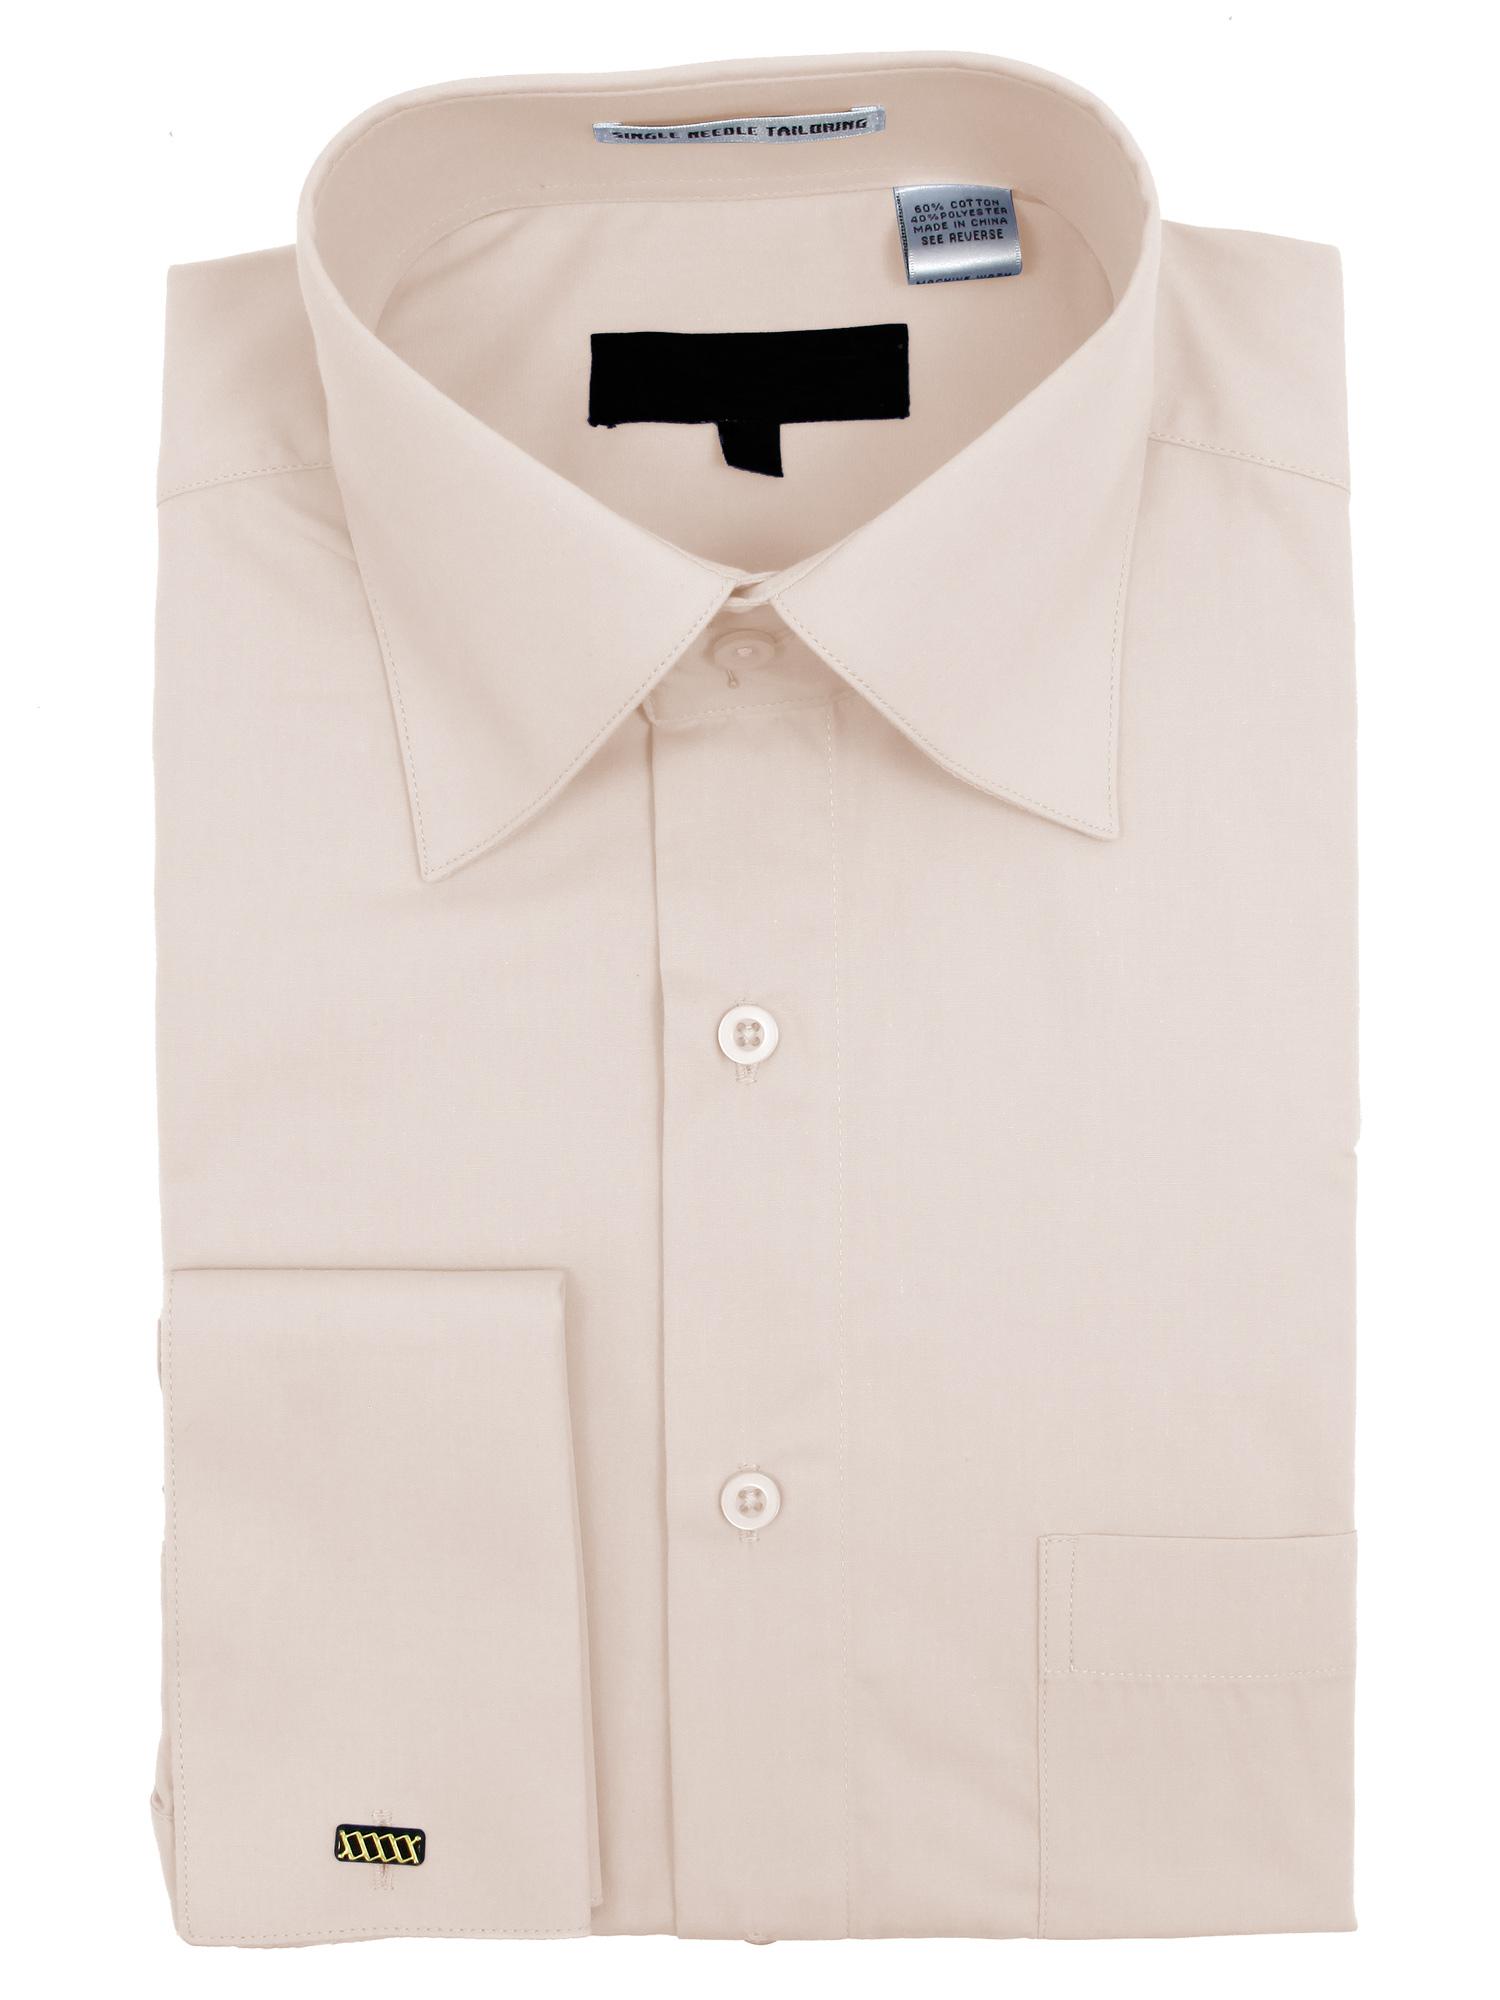 Men's Wrinkle Free Cotton Blend French Cuff Dress Shirts